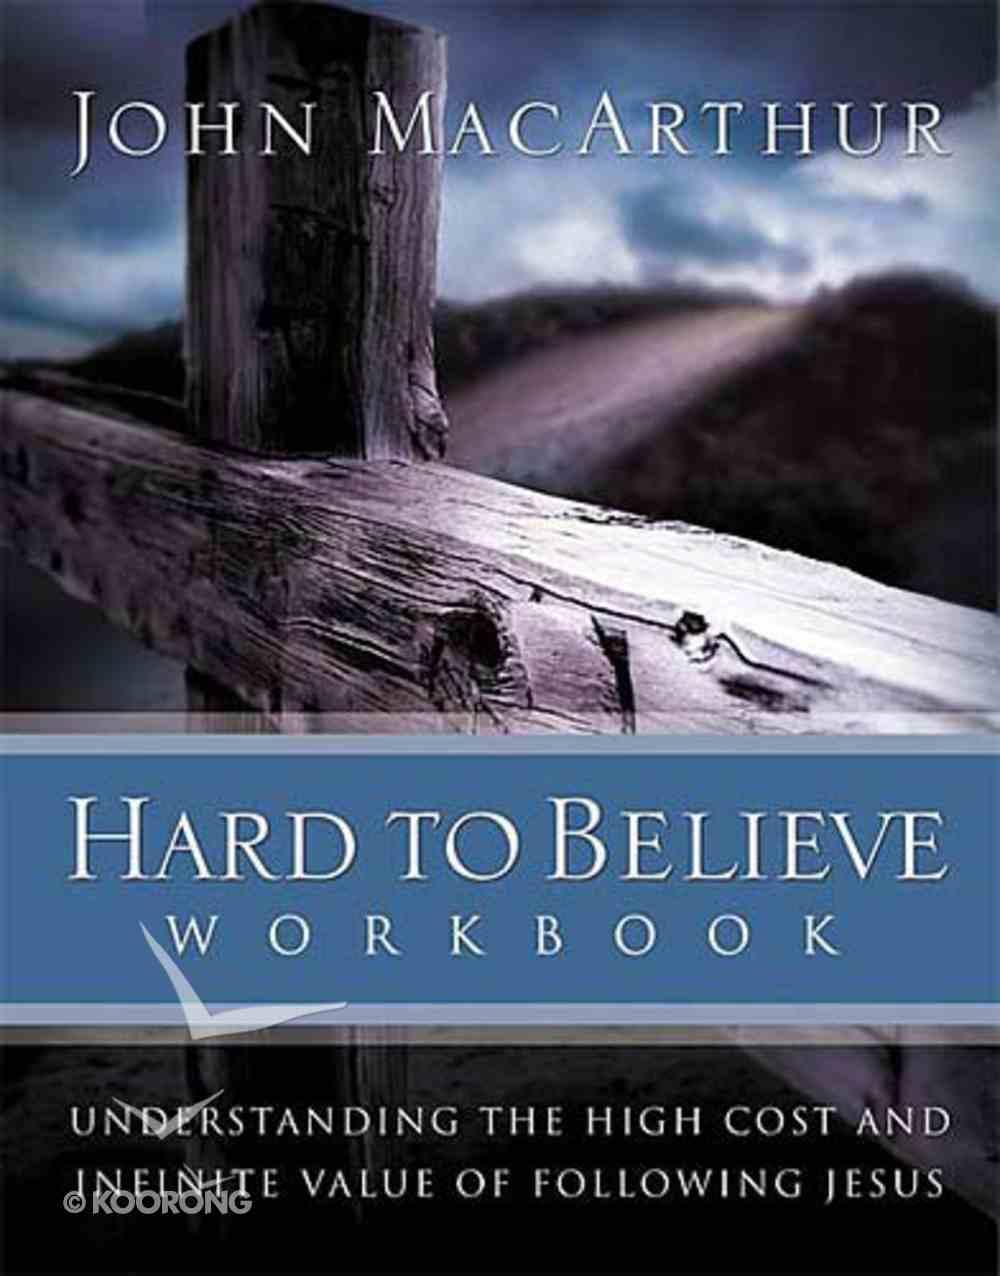 Hard to Believe (Workbook) Paperback